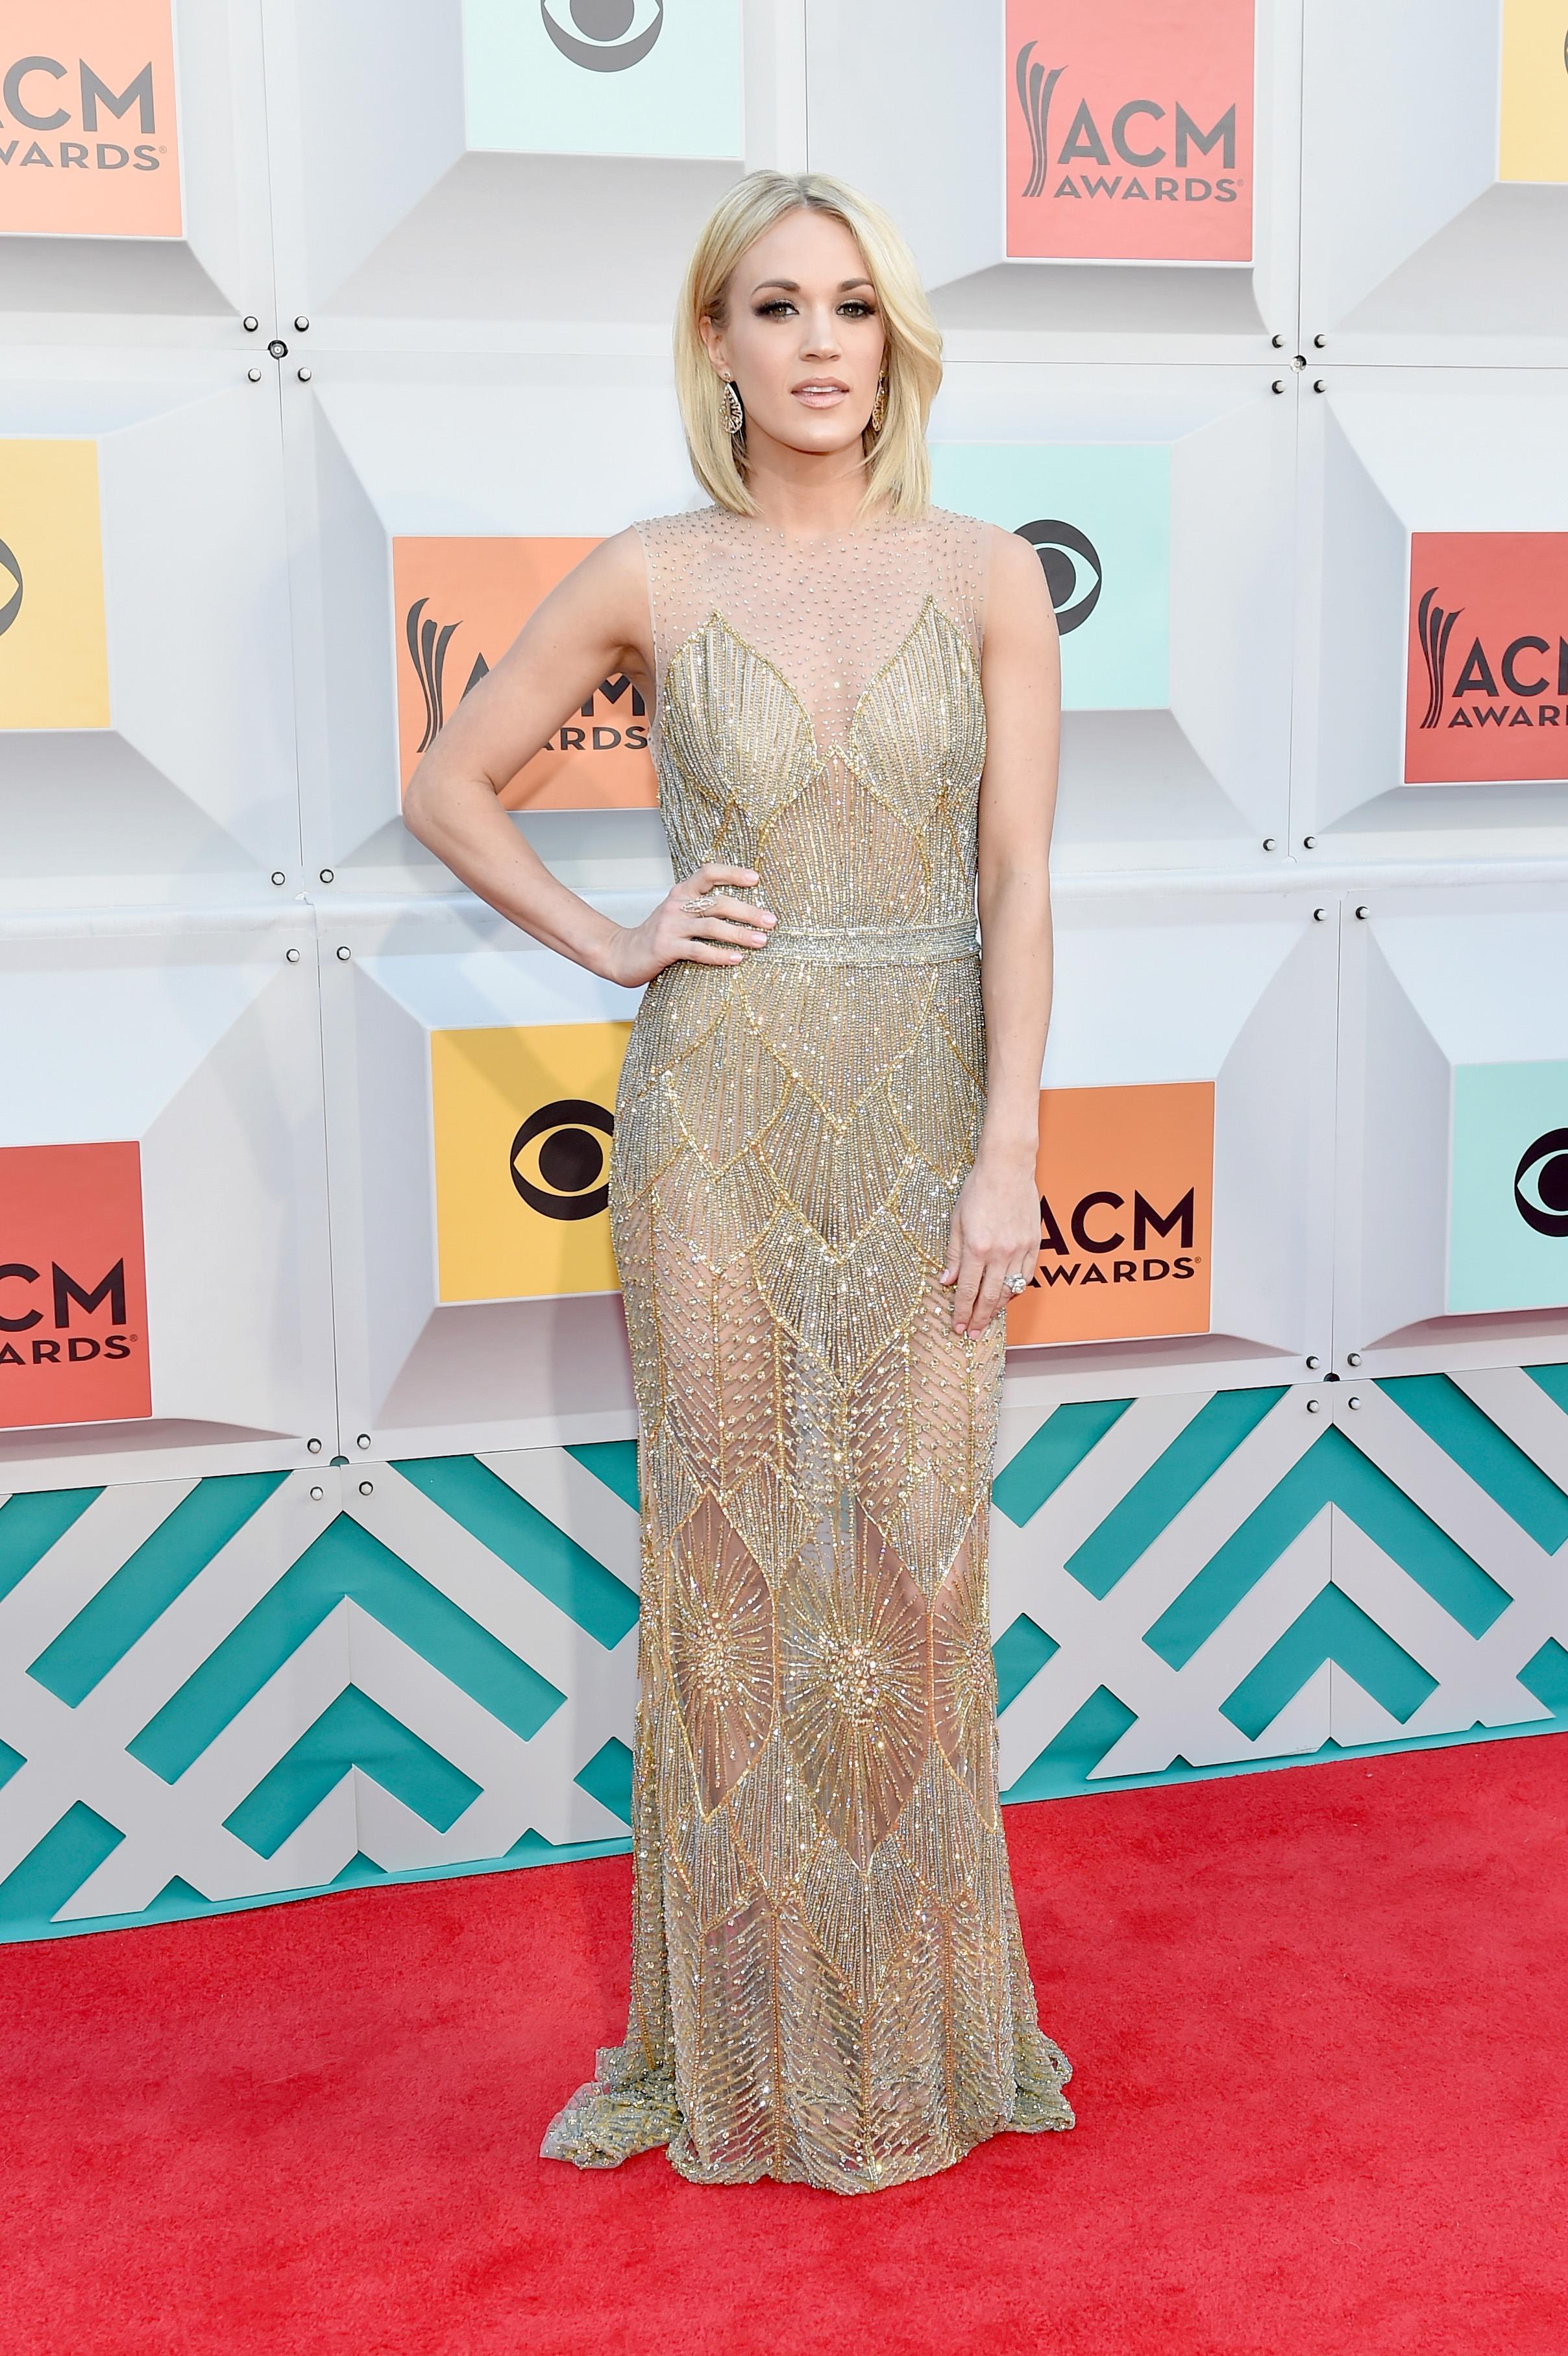 Carrie Underwood, Lauren Alaina, Maddie & Tae, More Walk